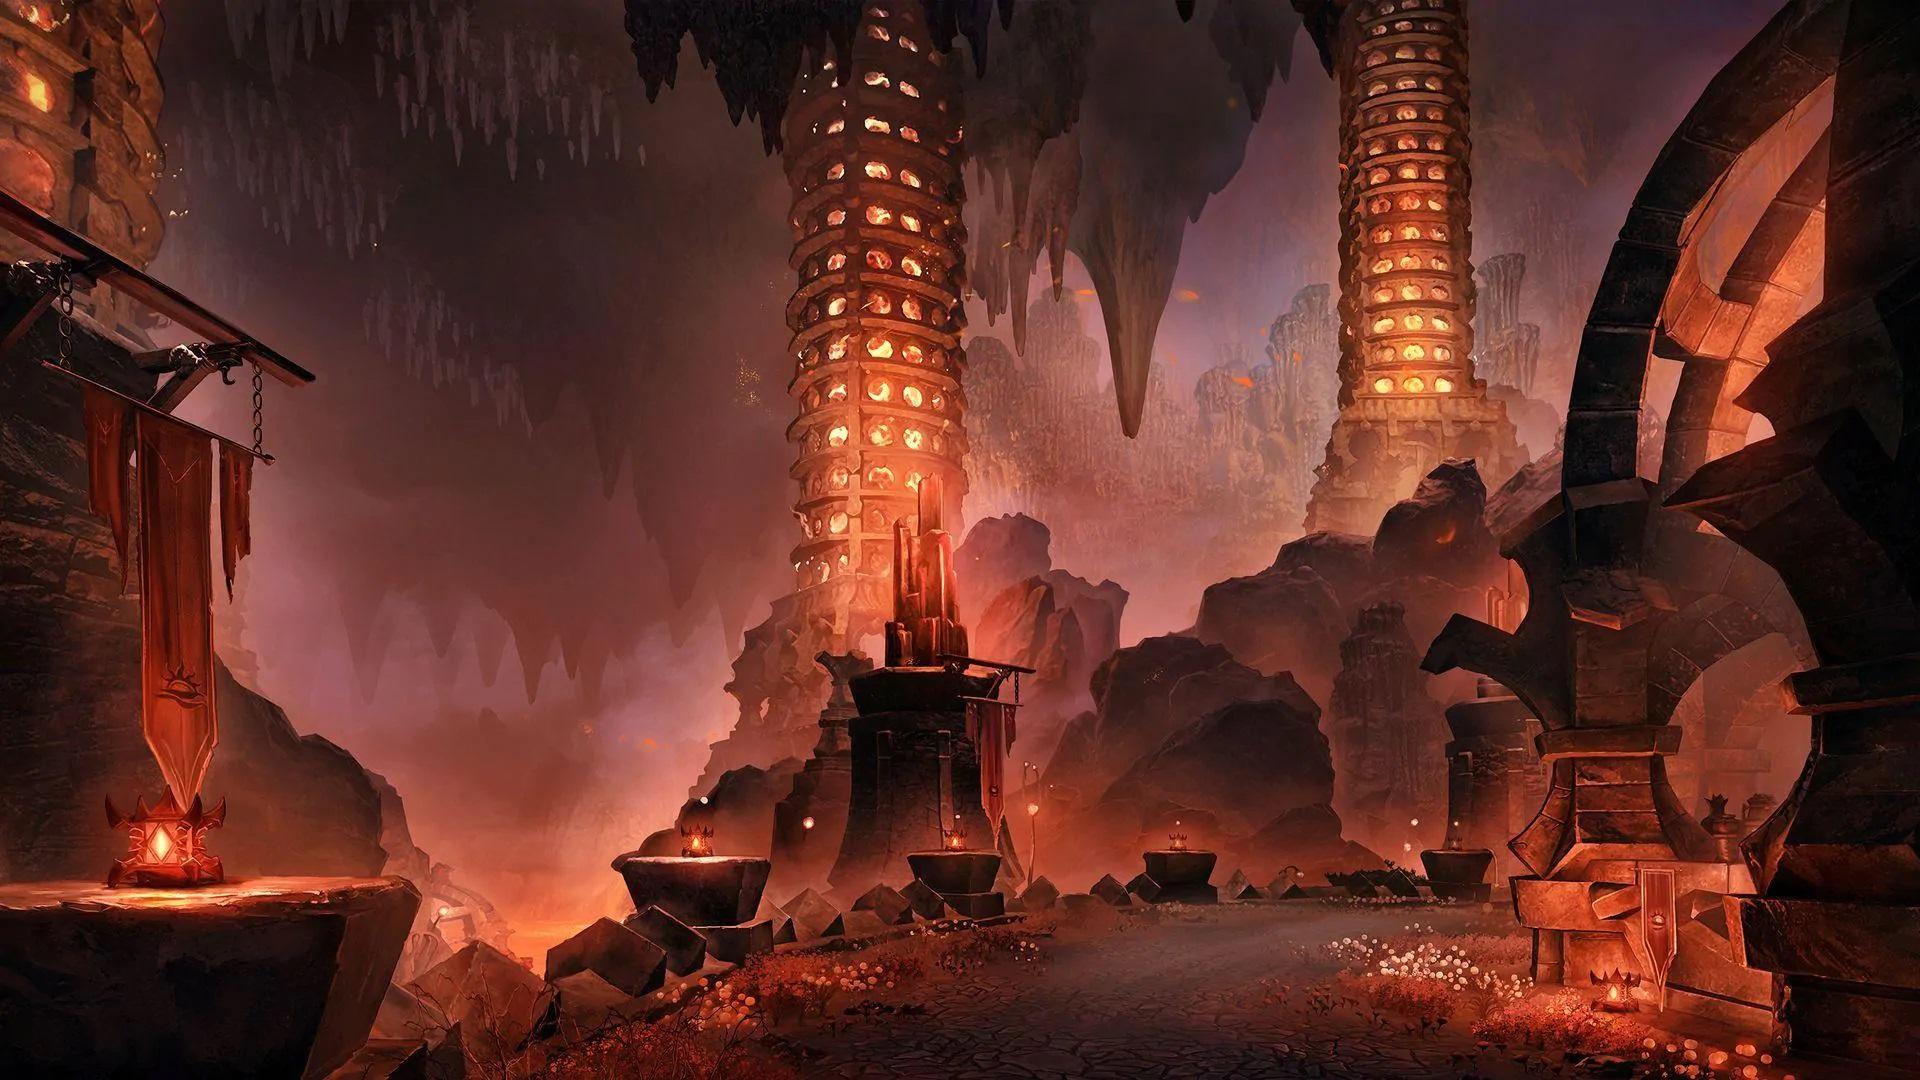 The Elder Scrolls Online Flames of Ambition the cauldron ESO Flames of Ambition the cauldron